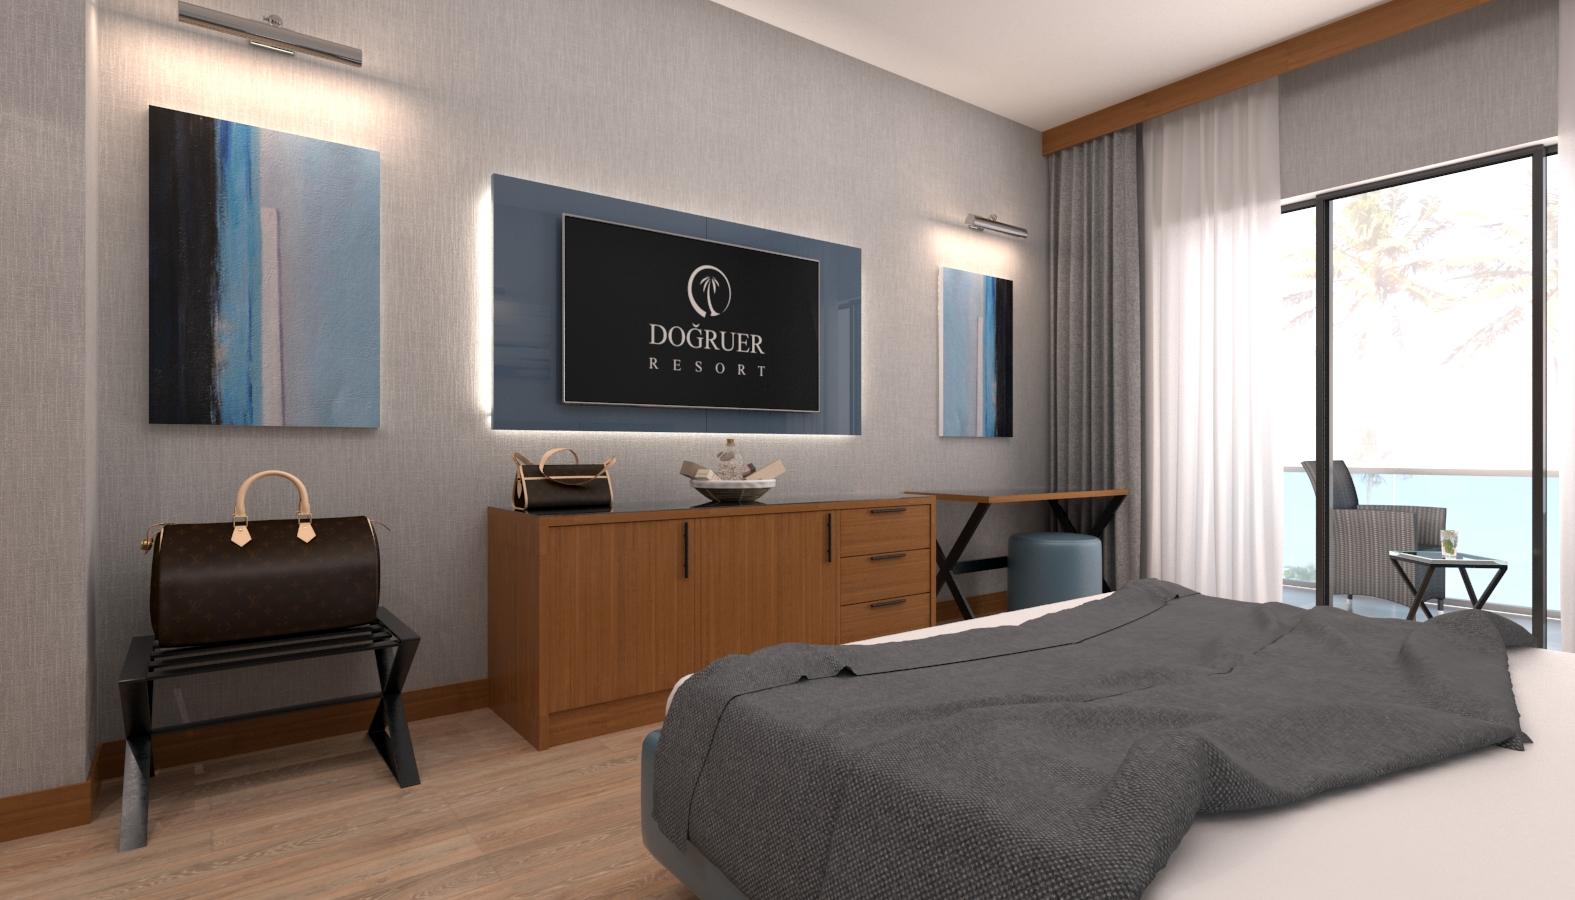 Dogruer hotel, Hotels